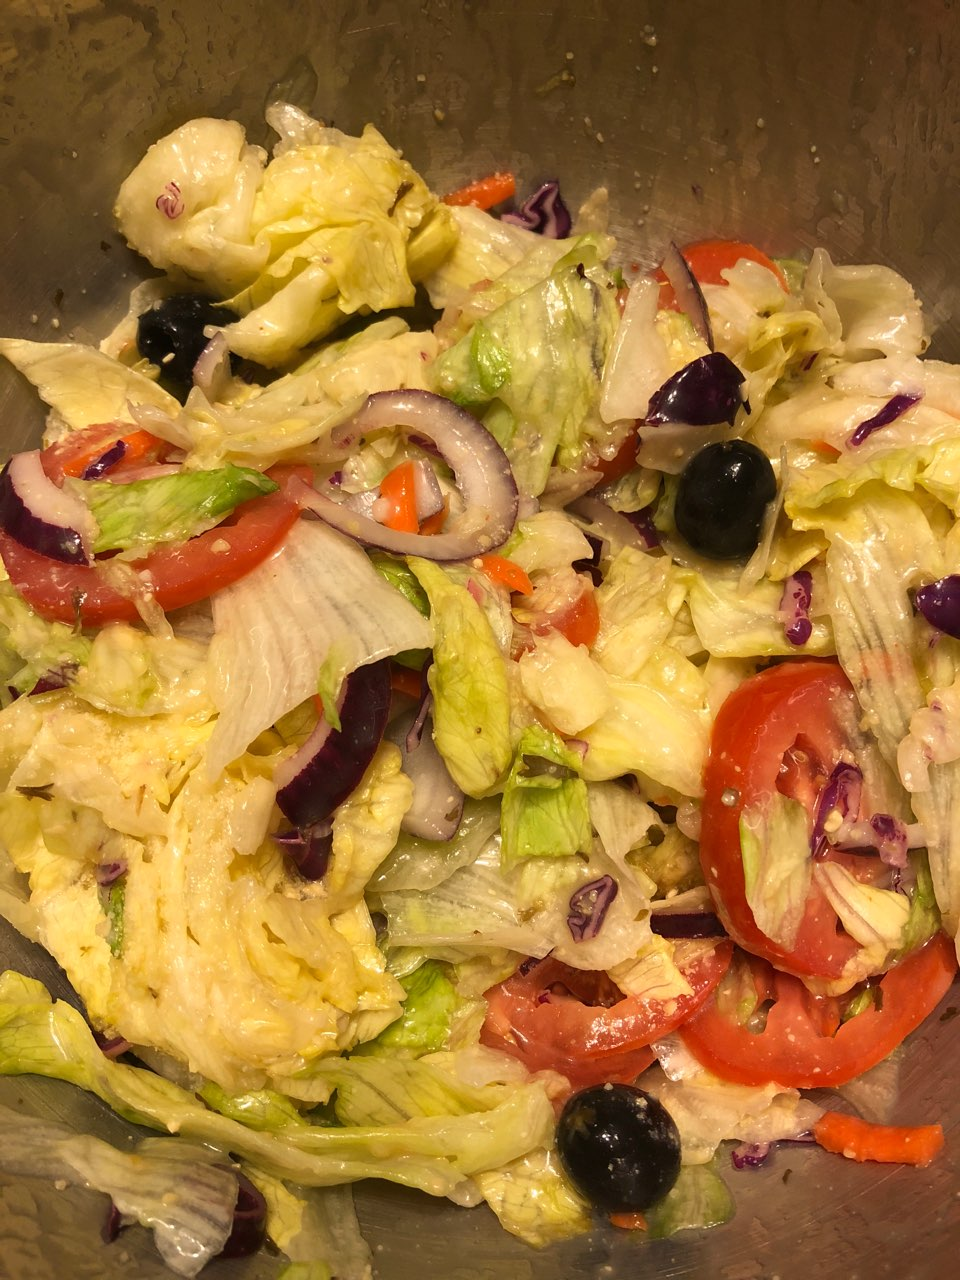 olive garden salad - Olive Garden Salad Calories